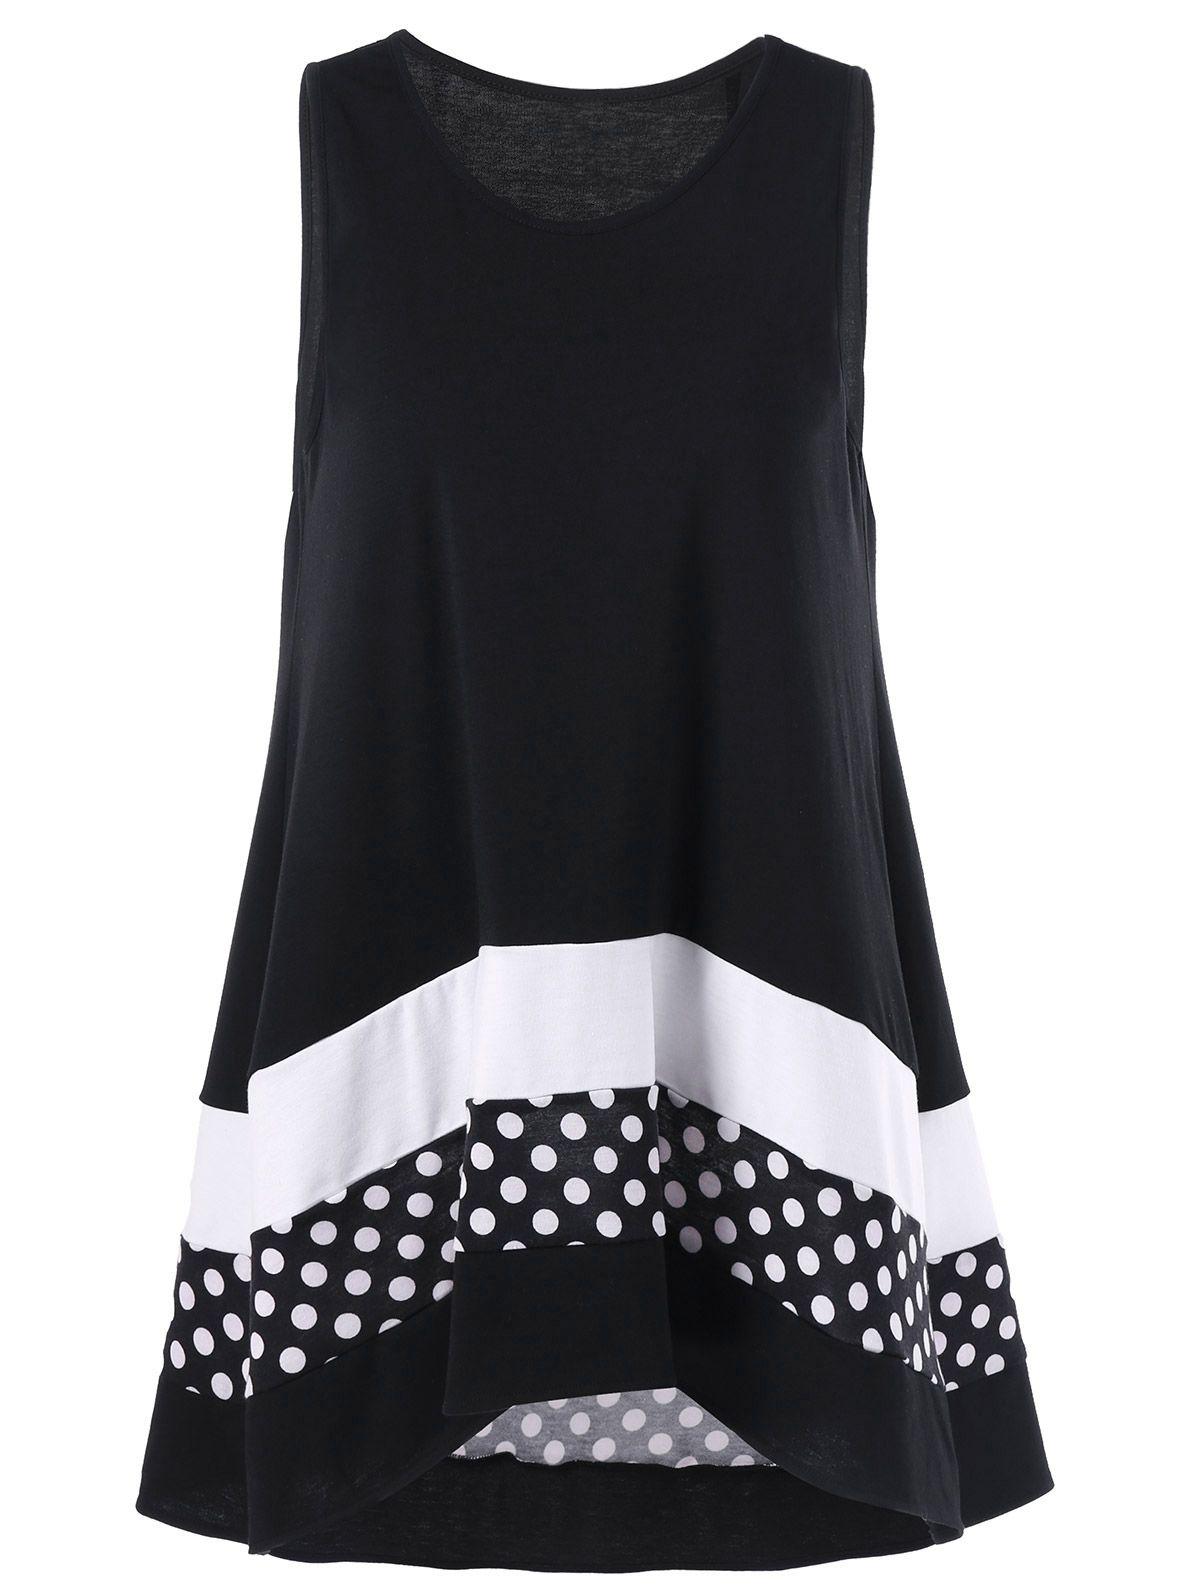 654499cf2183dc Plus Size Polka Dot Sleeveless Tunic Top